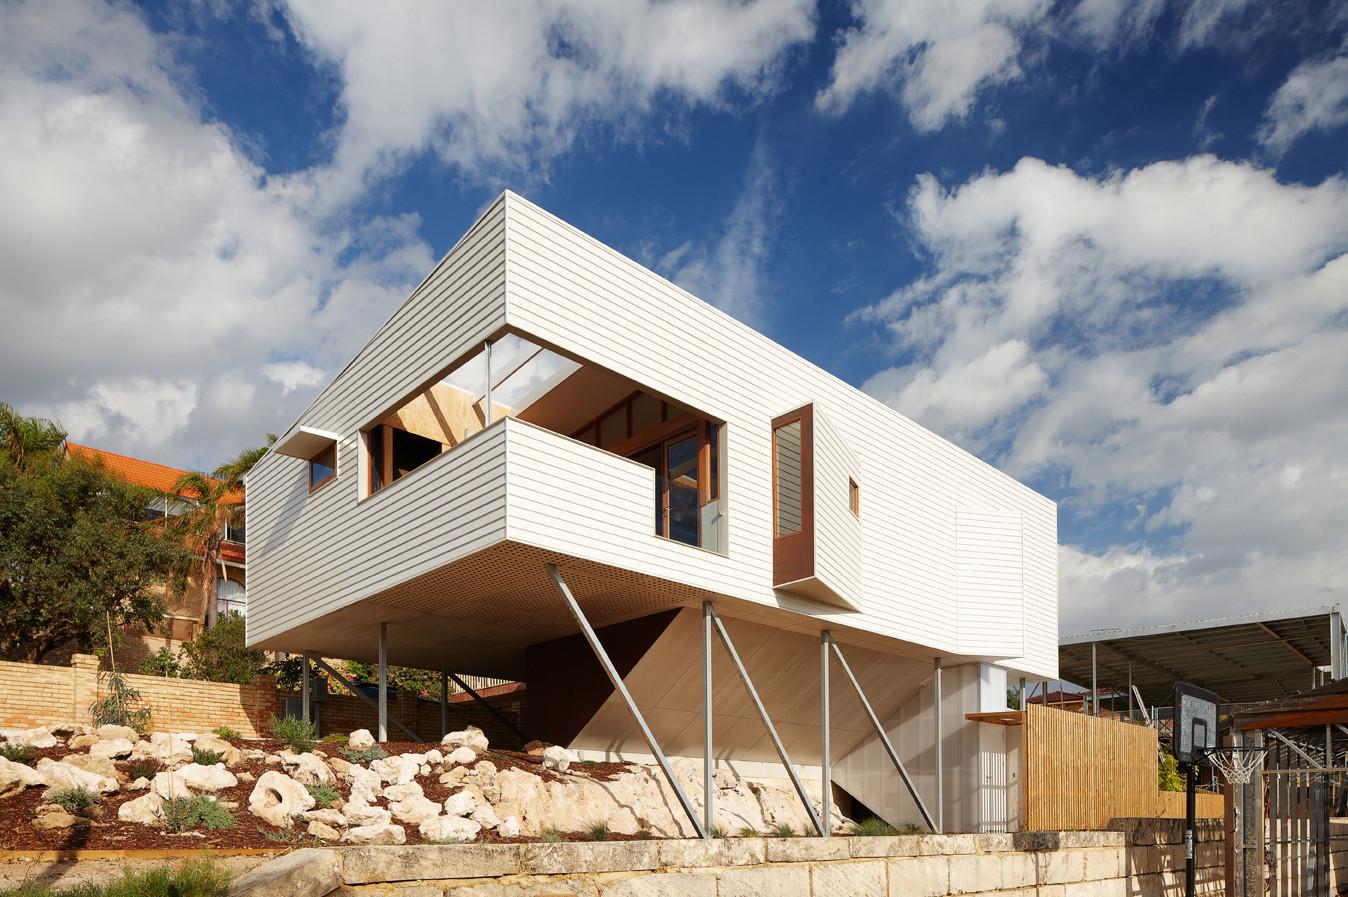 Suburban Beach House / David Barr + Ross Brewin, © Robert Frith